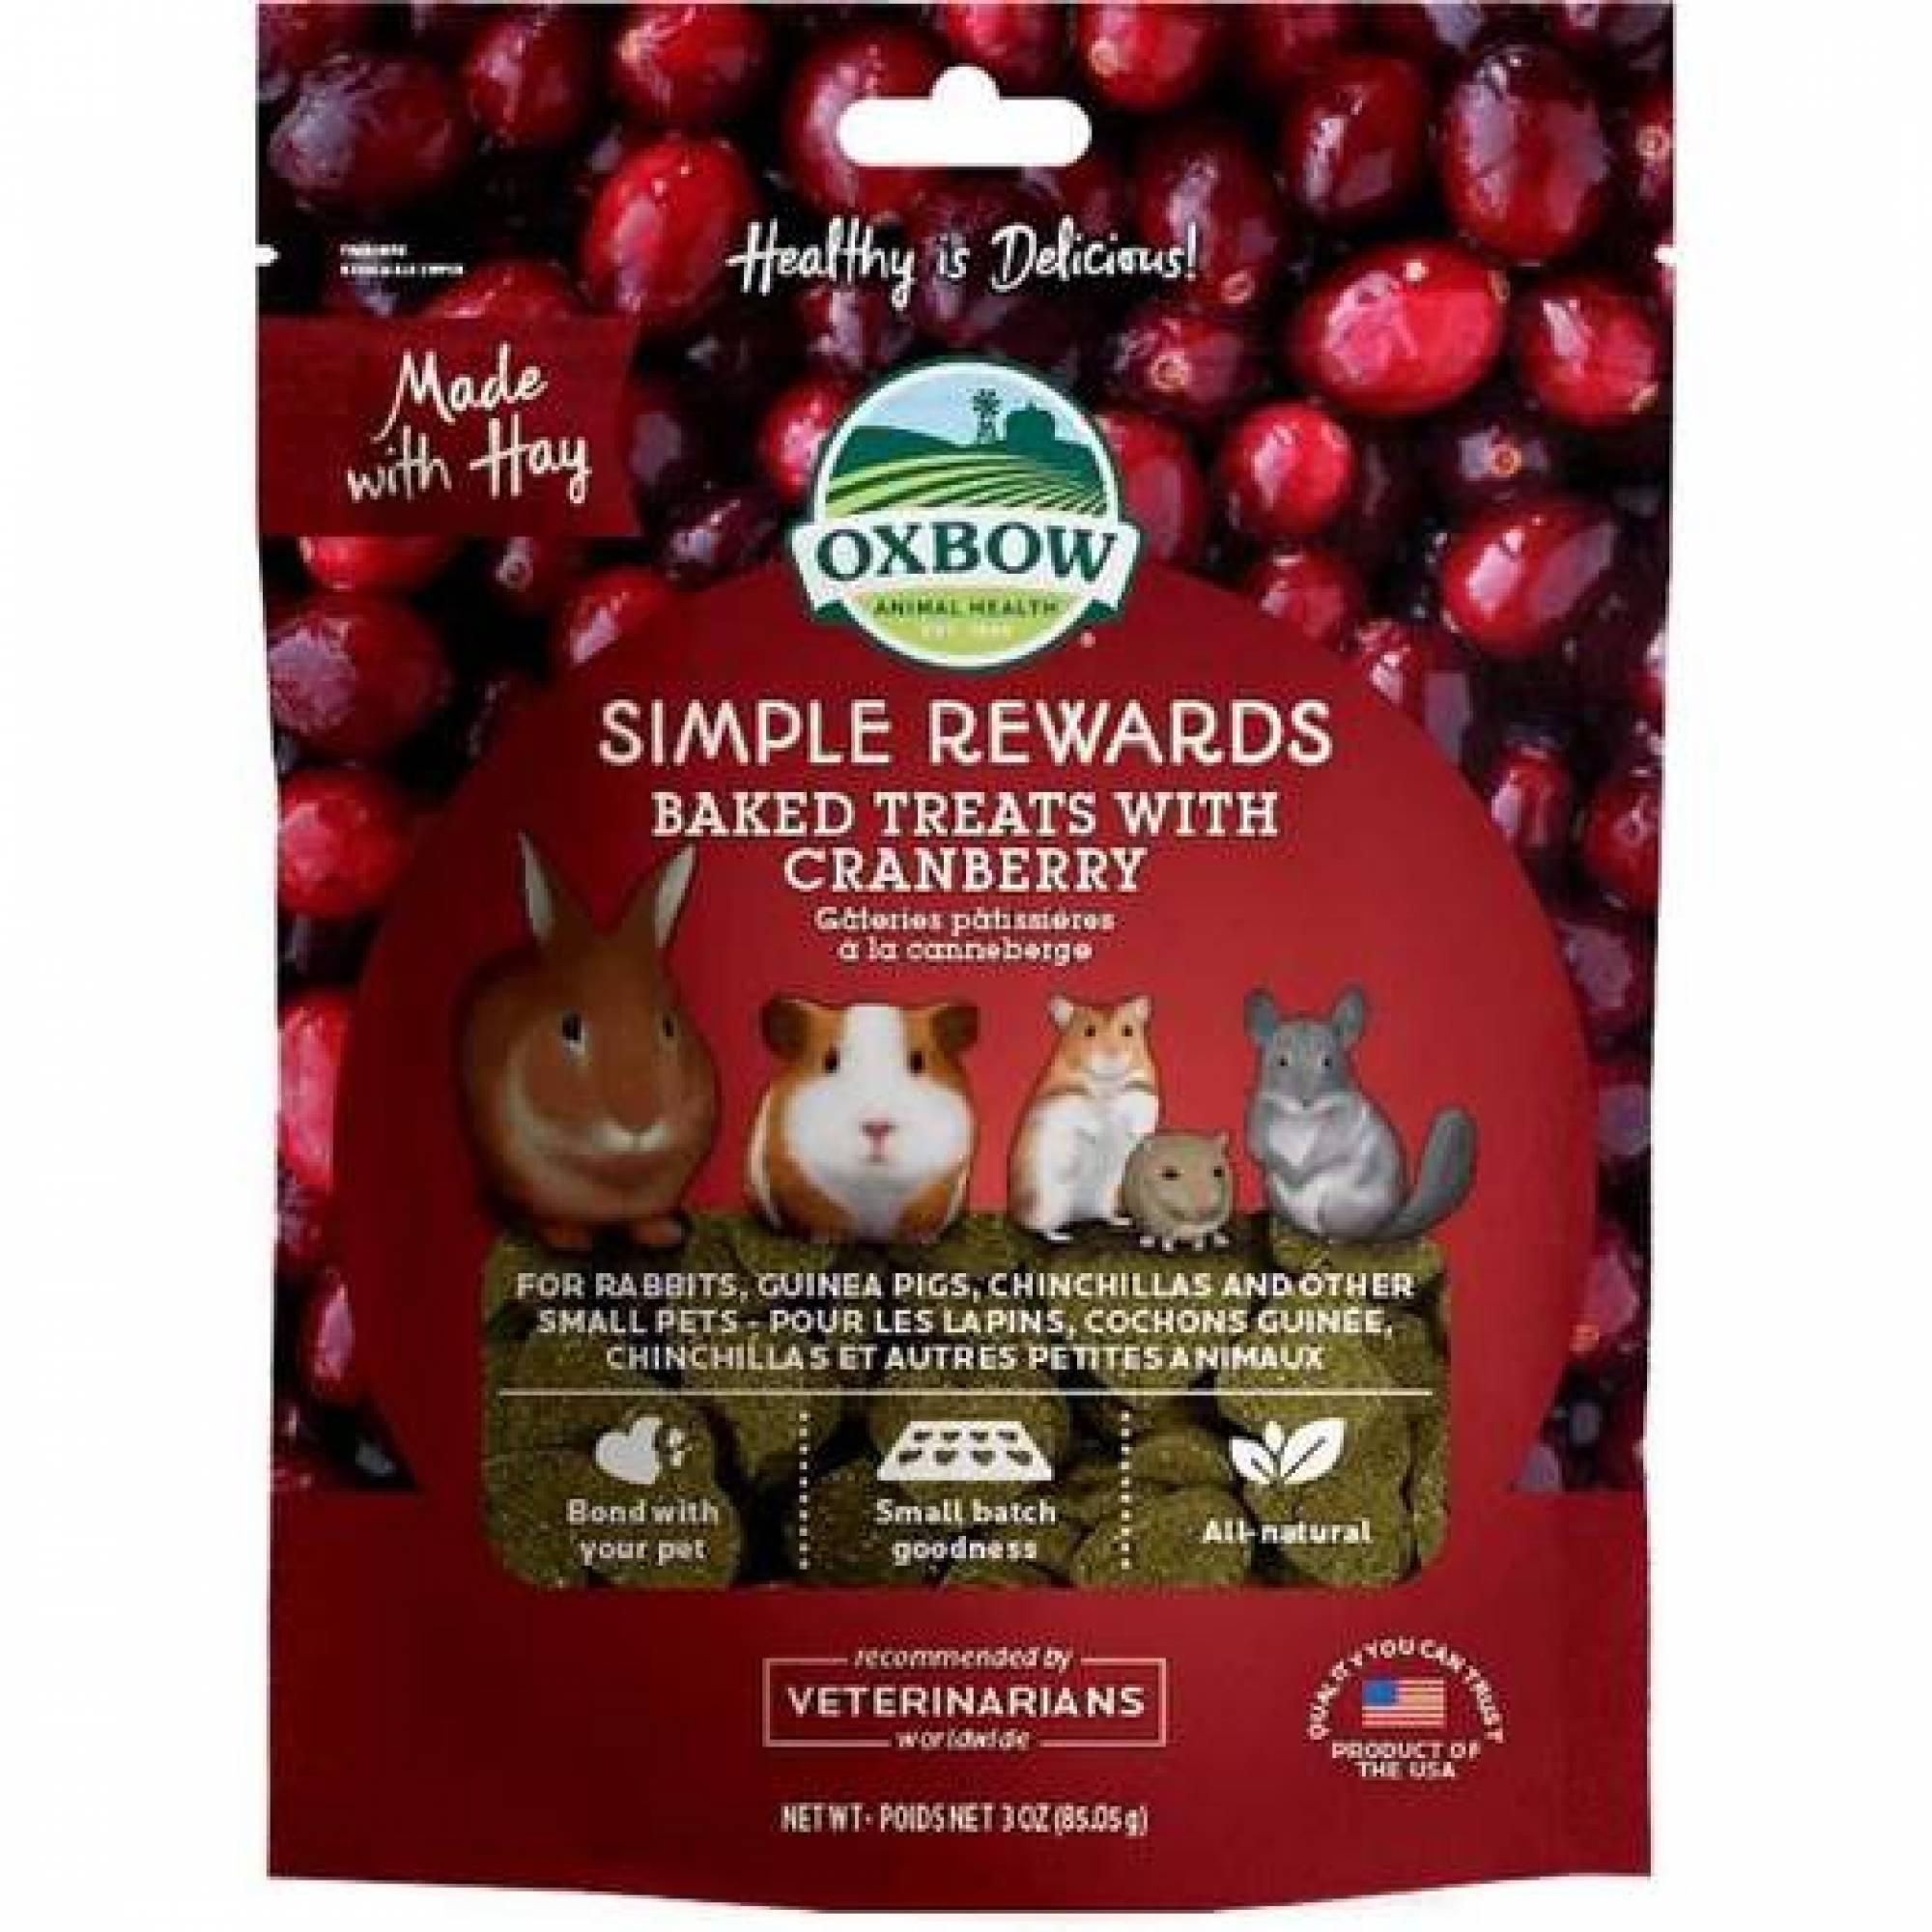 Oxbow Simple Rewards Baked Treats - Cranberry 60g